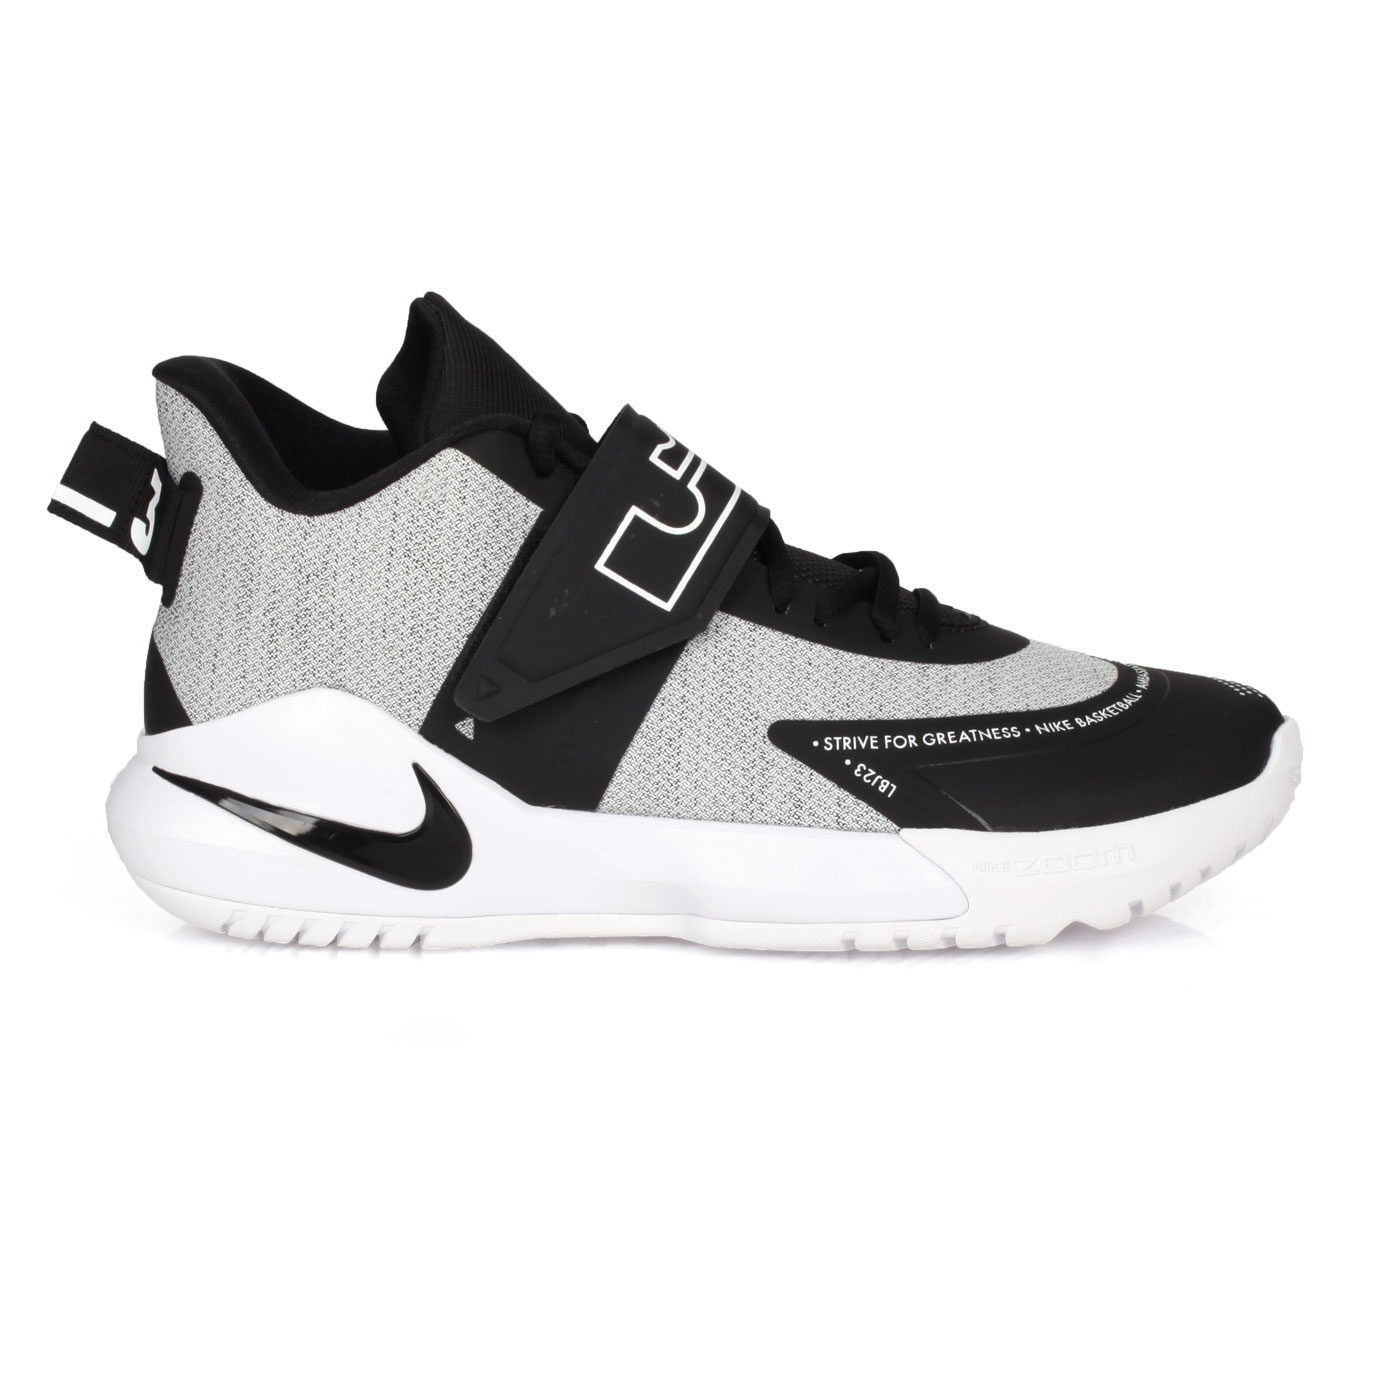 NIKE 男款籃球鞋  @AMBASSADOR XII@BQ5436005 - 黑白